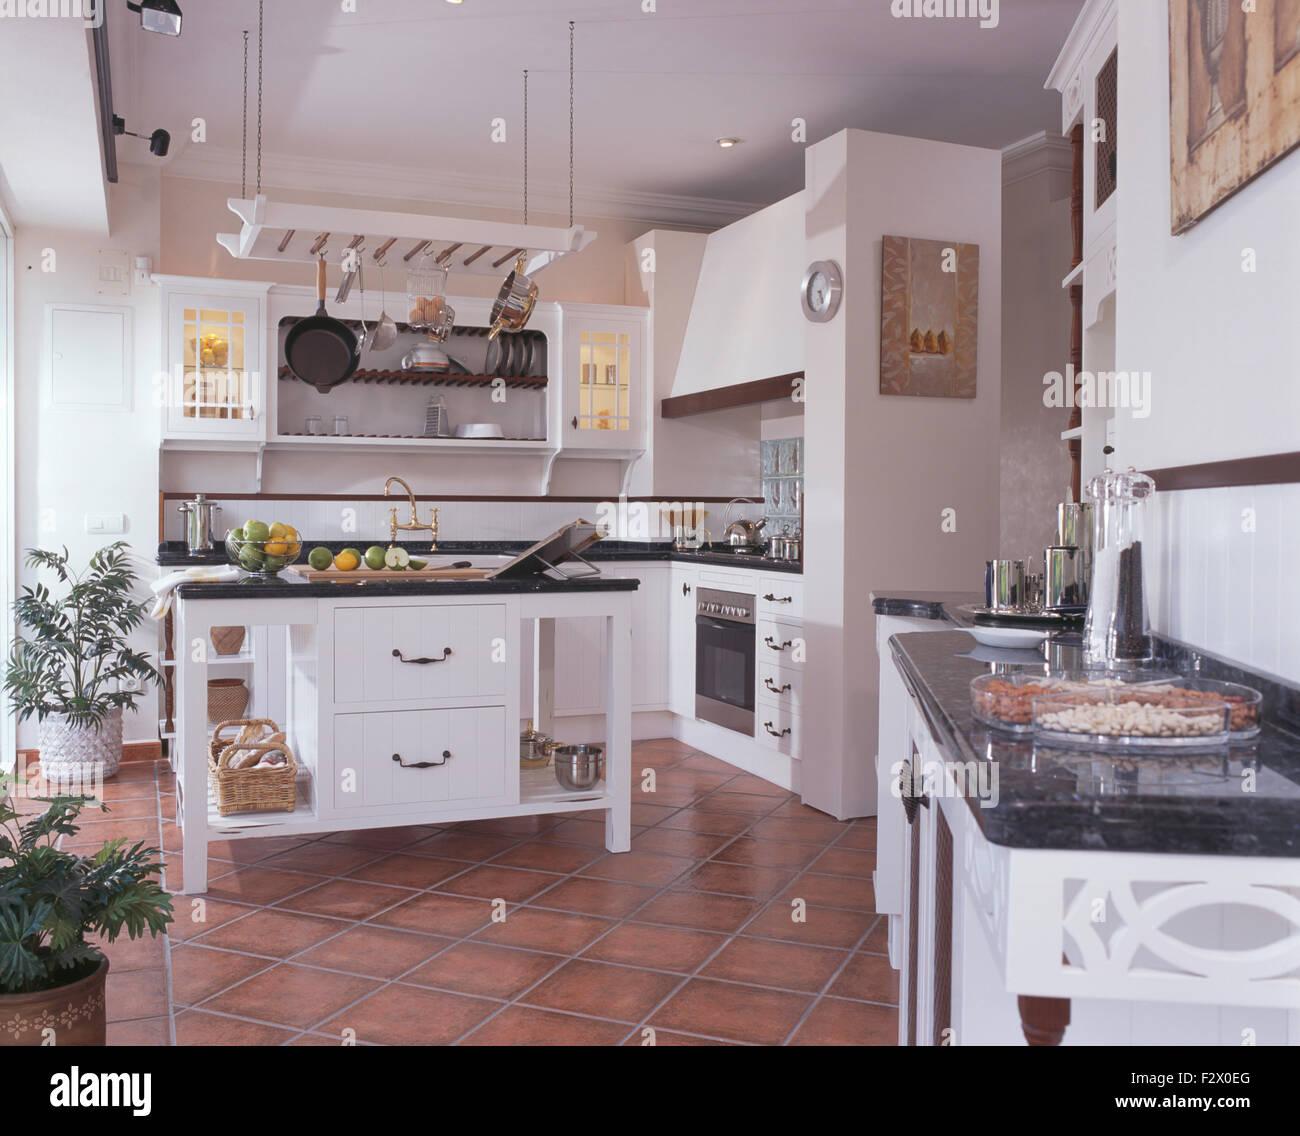 Terracotta Tiled Floor In Country Stockfotos Terracotta